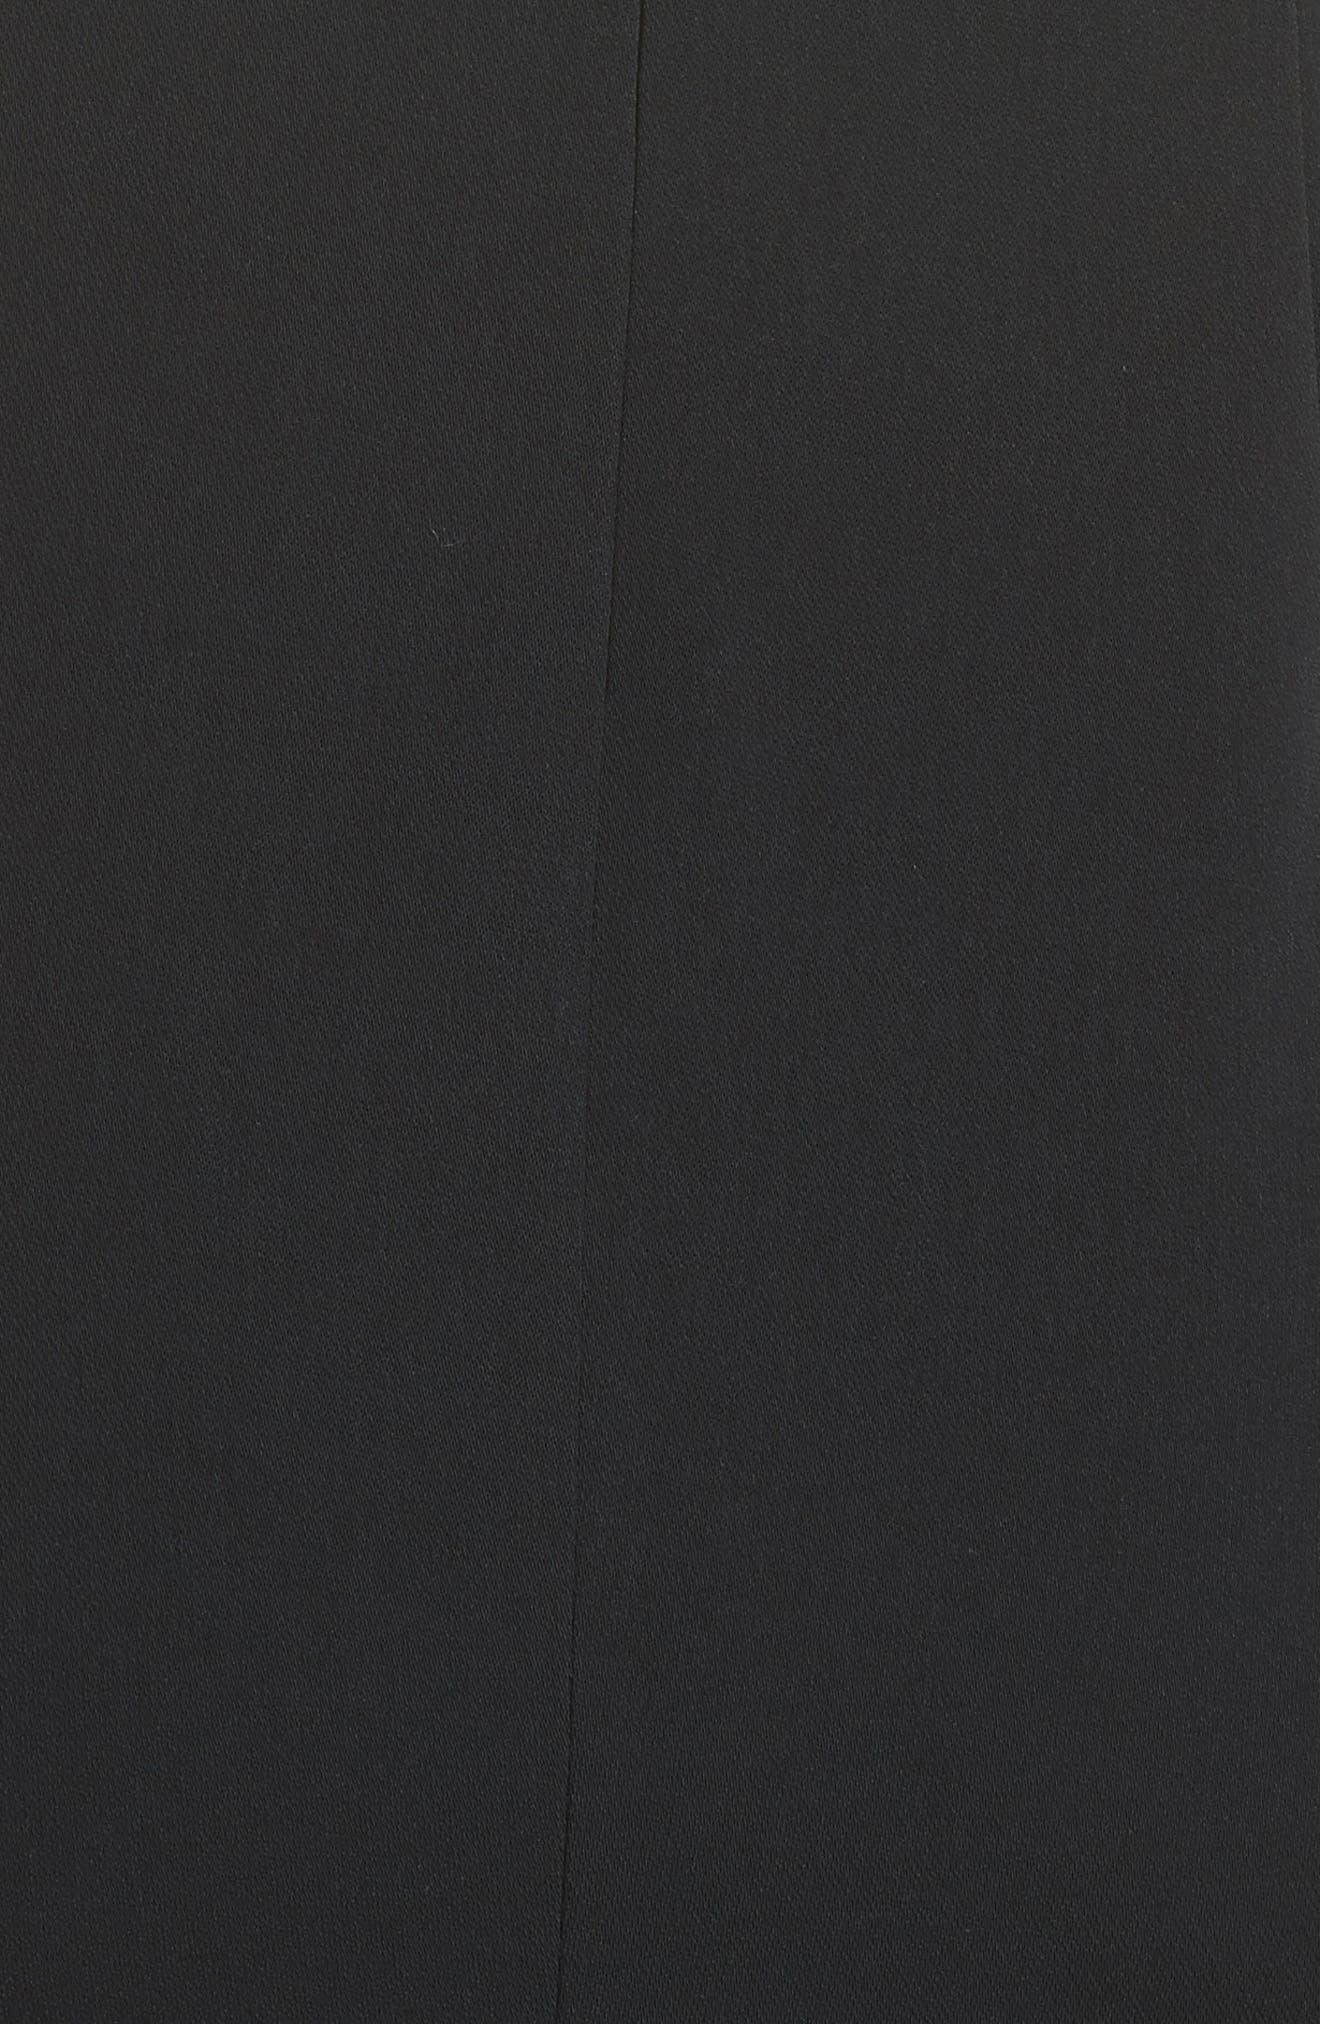 Stretch Cady Funnel Neck Dress,                             Alternate thumbnail 6, color,                             Caviar